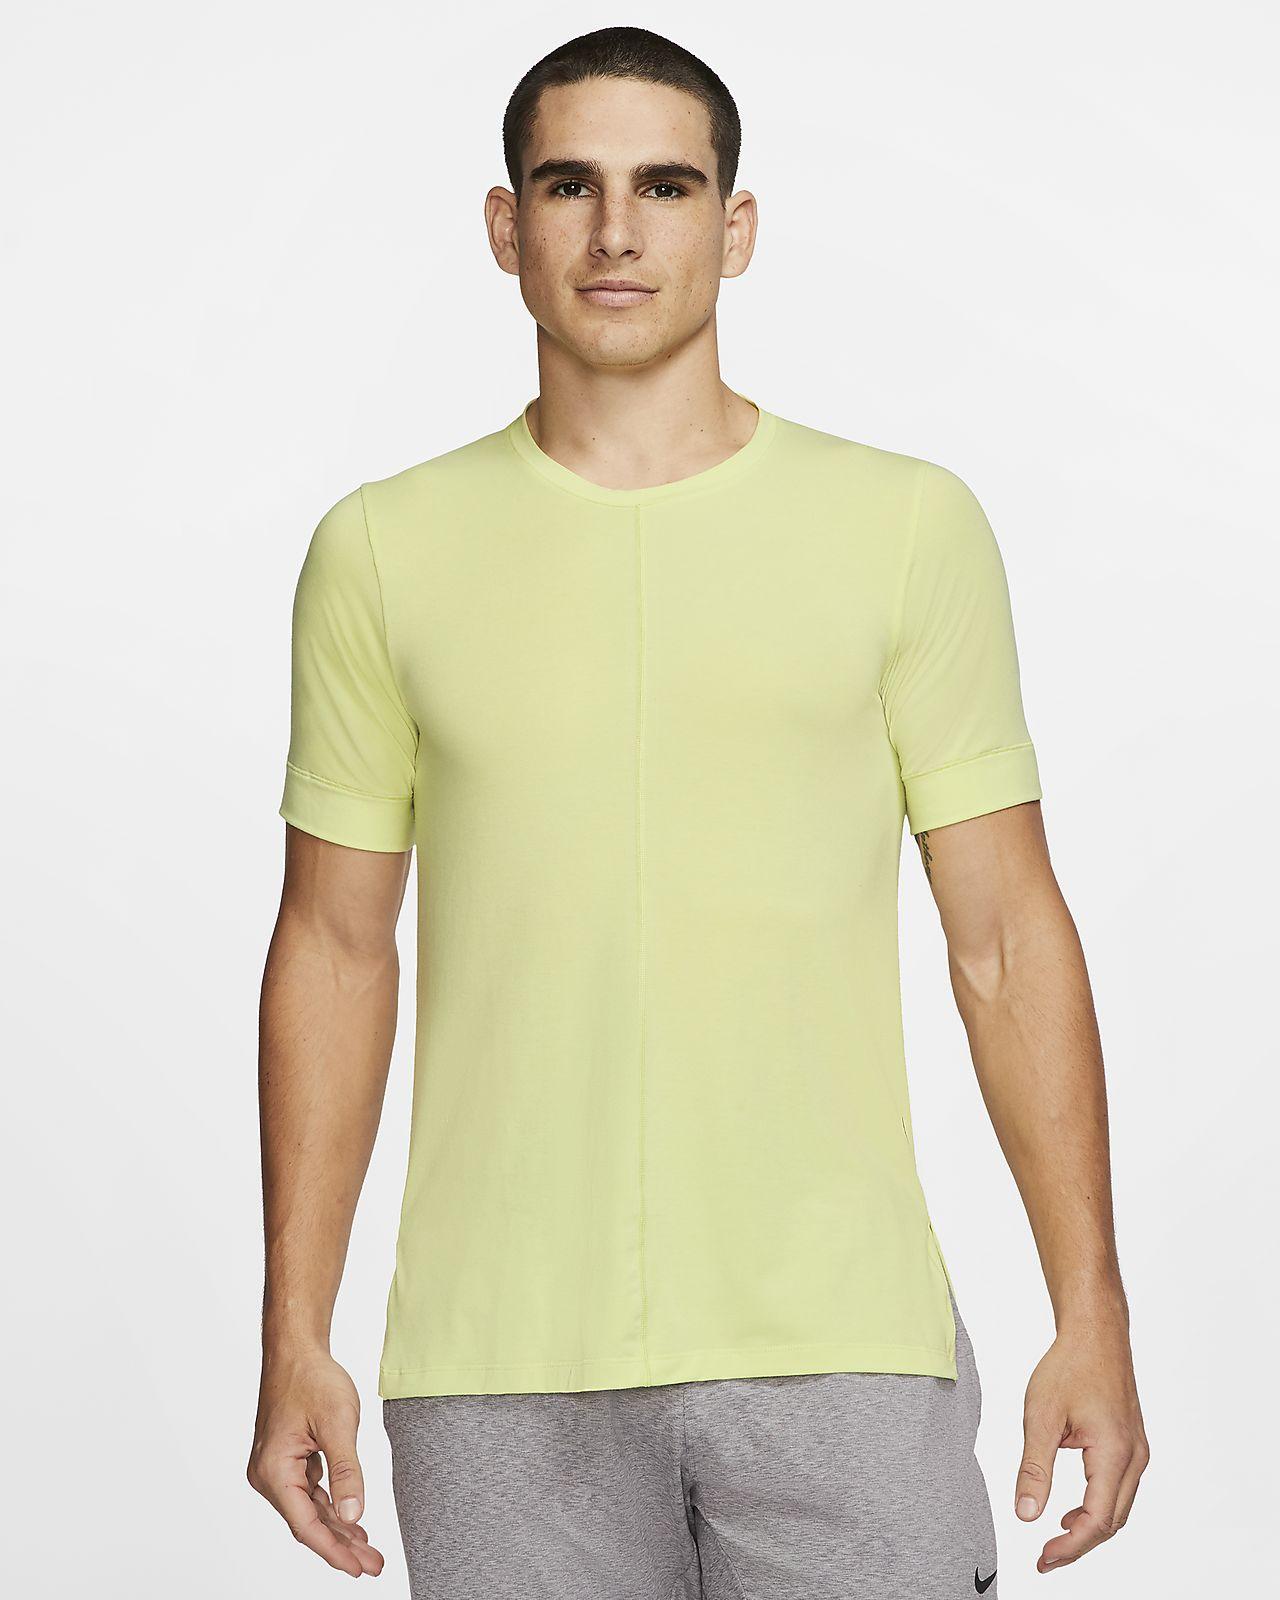 Nike Dri-FIT Men's Short-Sleeve Top